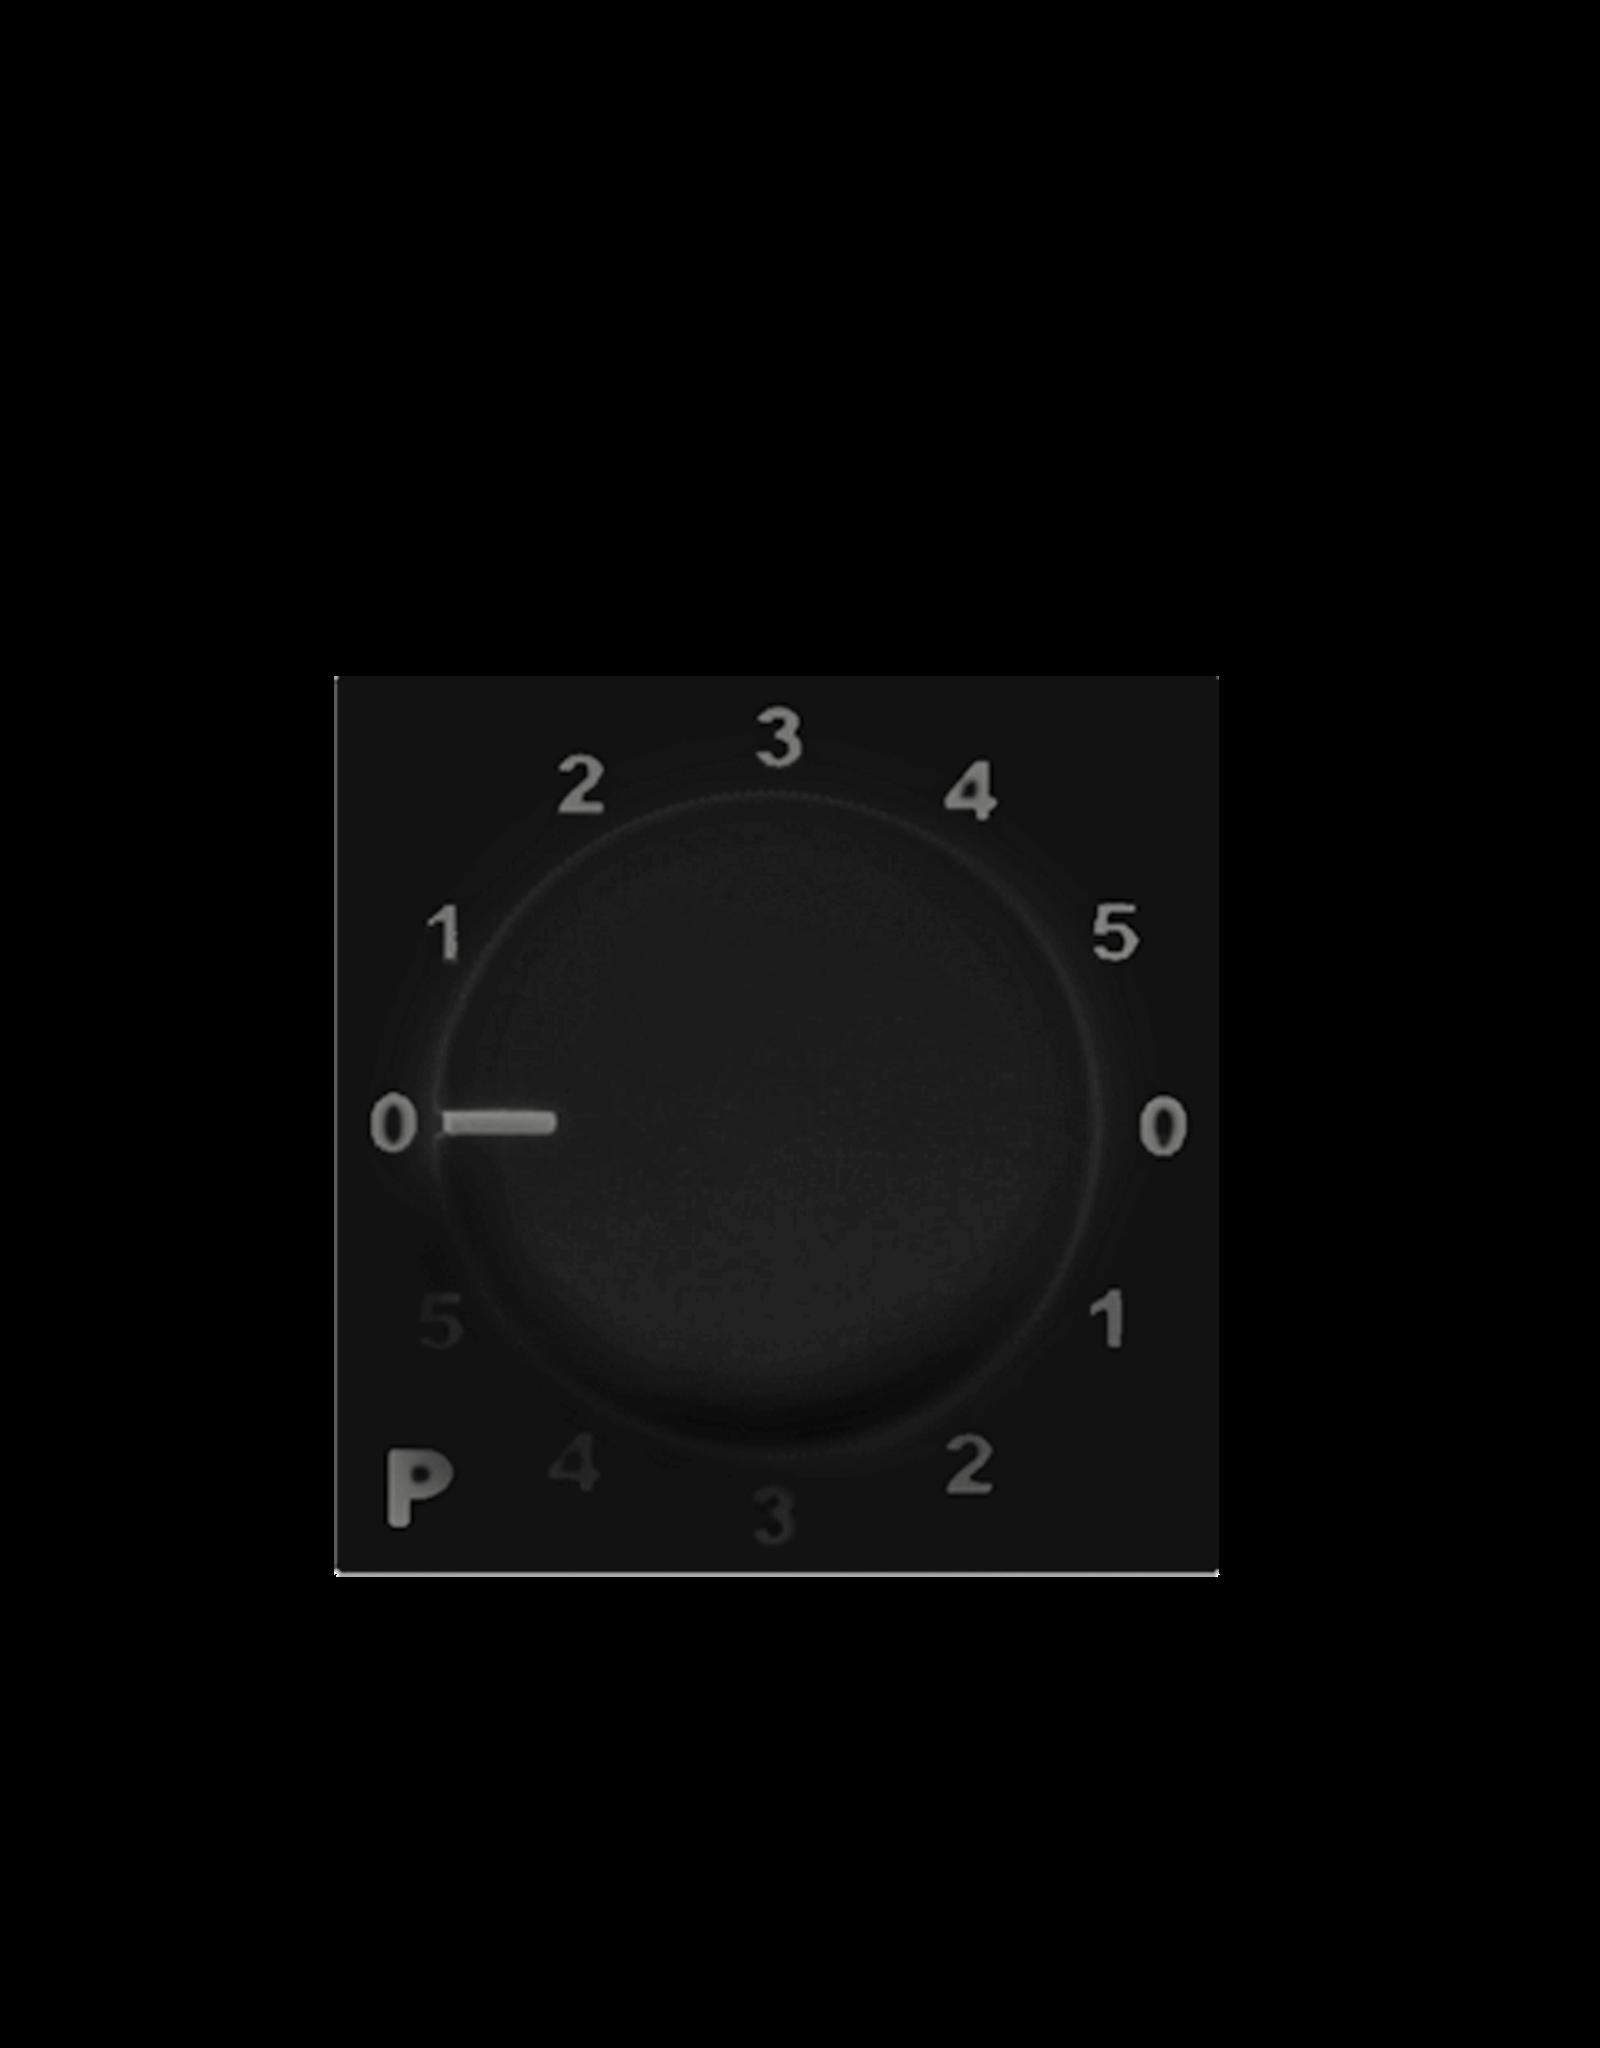 Audac Program selector 45 x 45 mm Black version